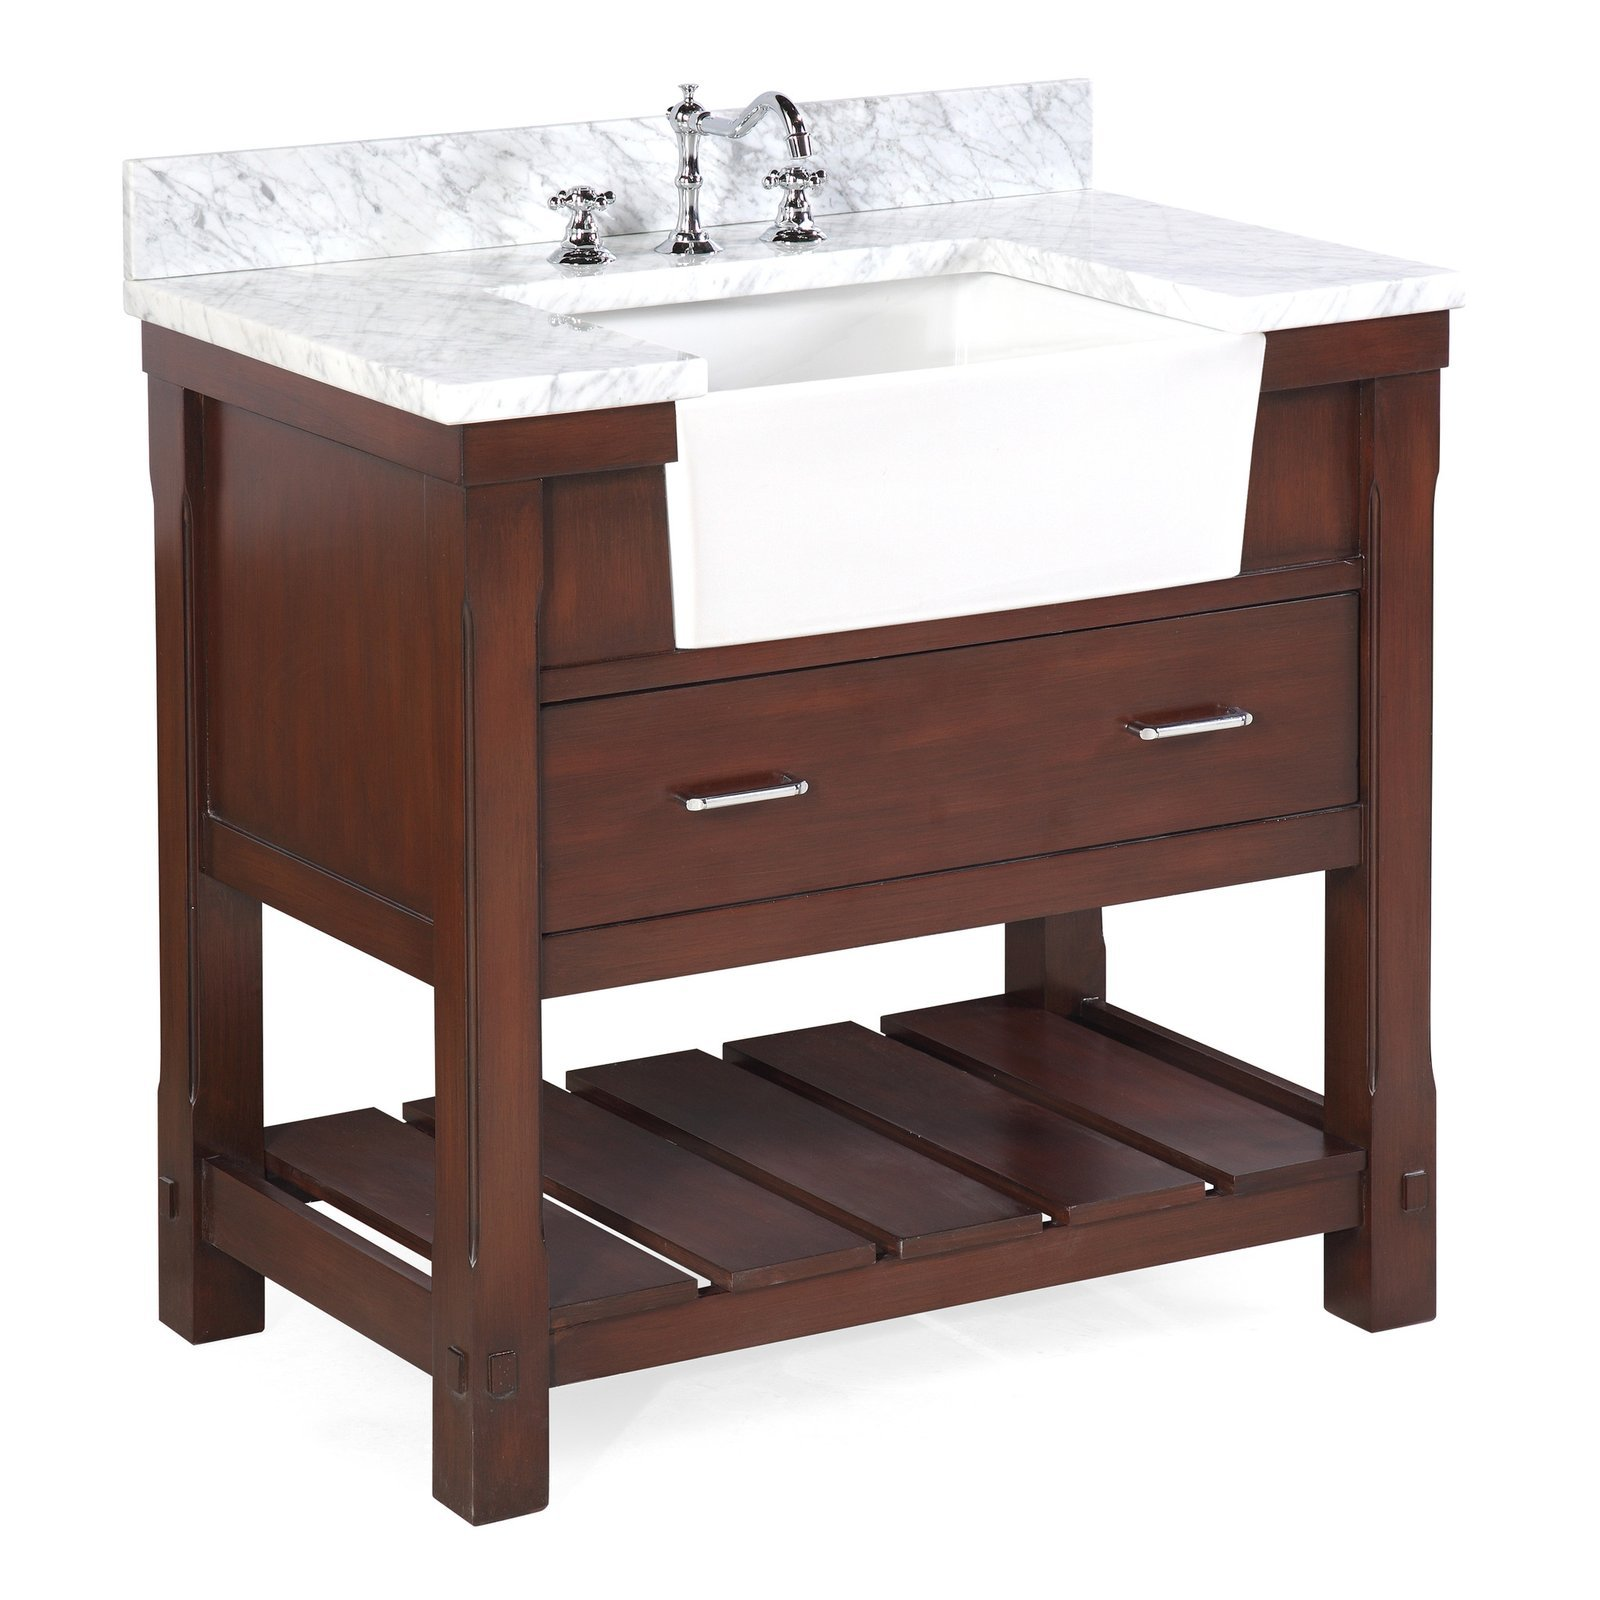 "Charlotte 36"" Chocolate Farmhouse Bathroom Vanity with ..."